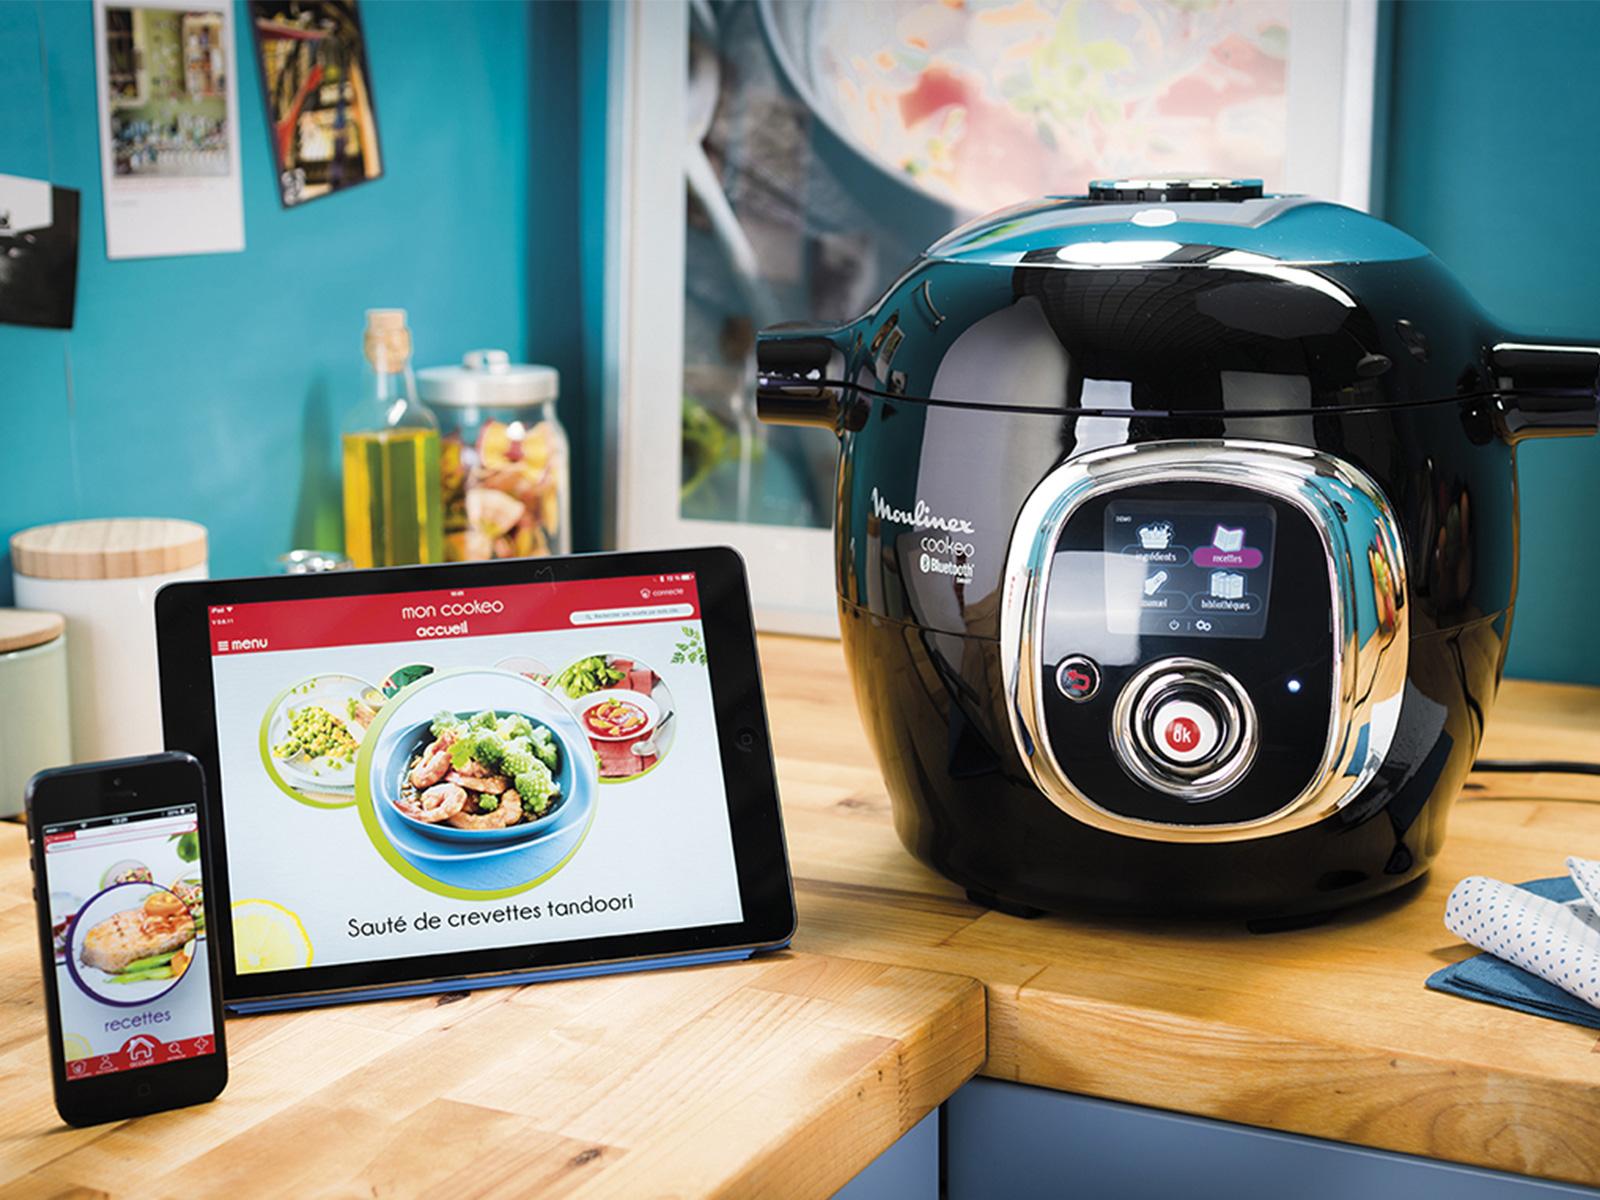 cr ativit culinaire avec le cookeo connect. Black Bedroom Furniture Sets. Home Design Ideas